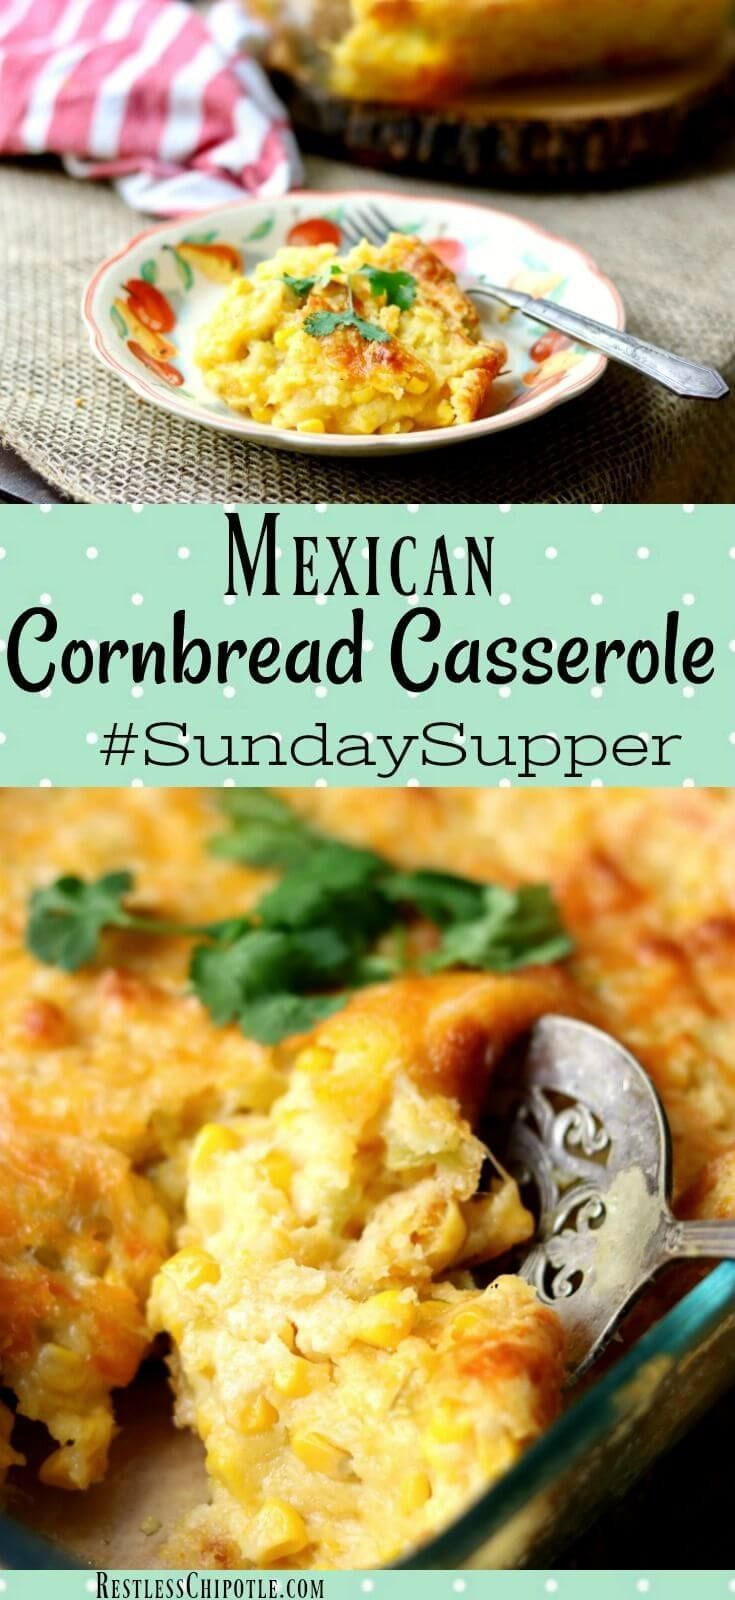 Cornbread Casserole Recipe with a Tex-Mex Twist